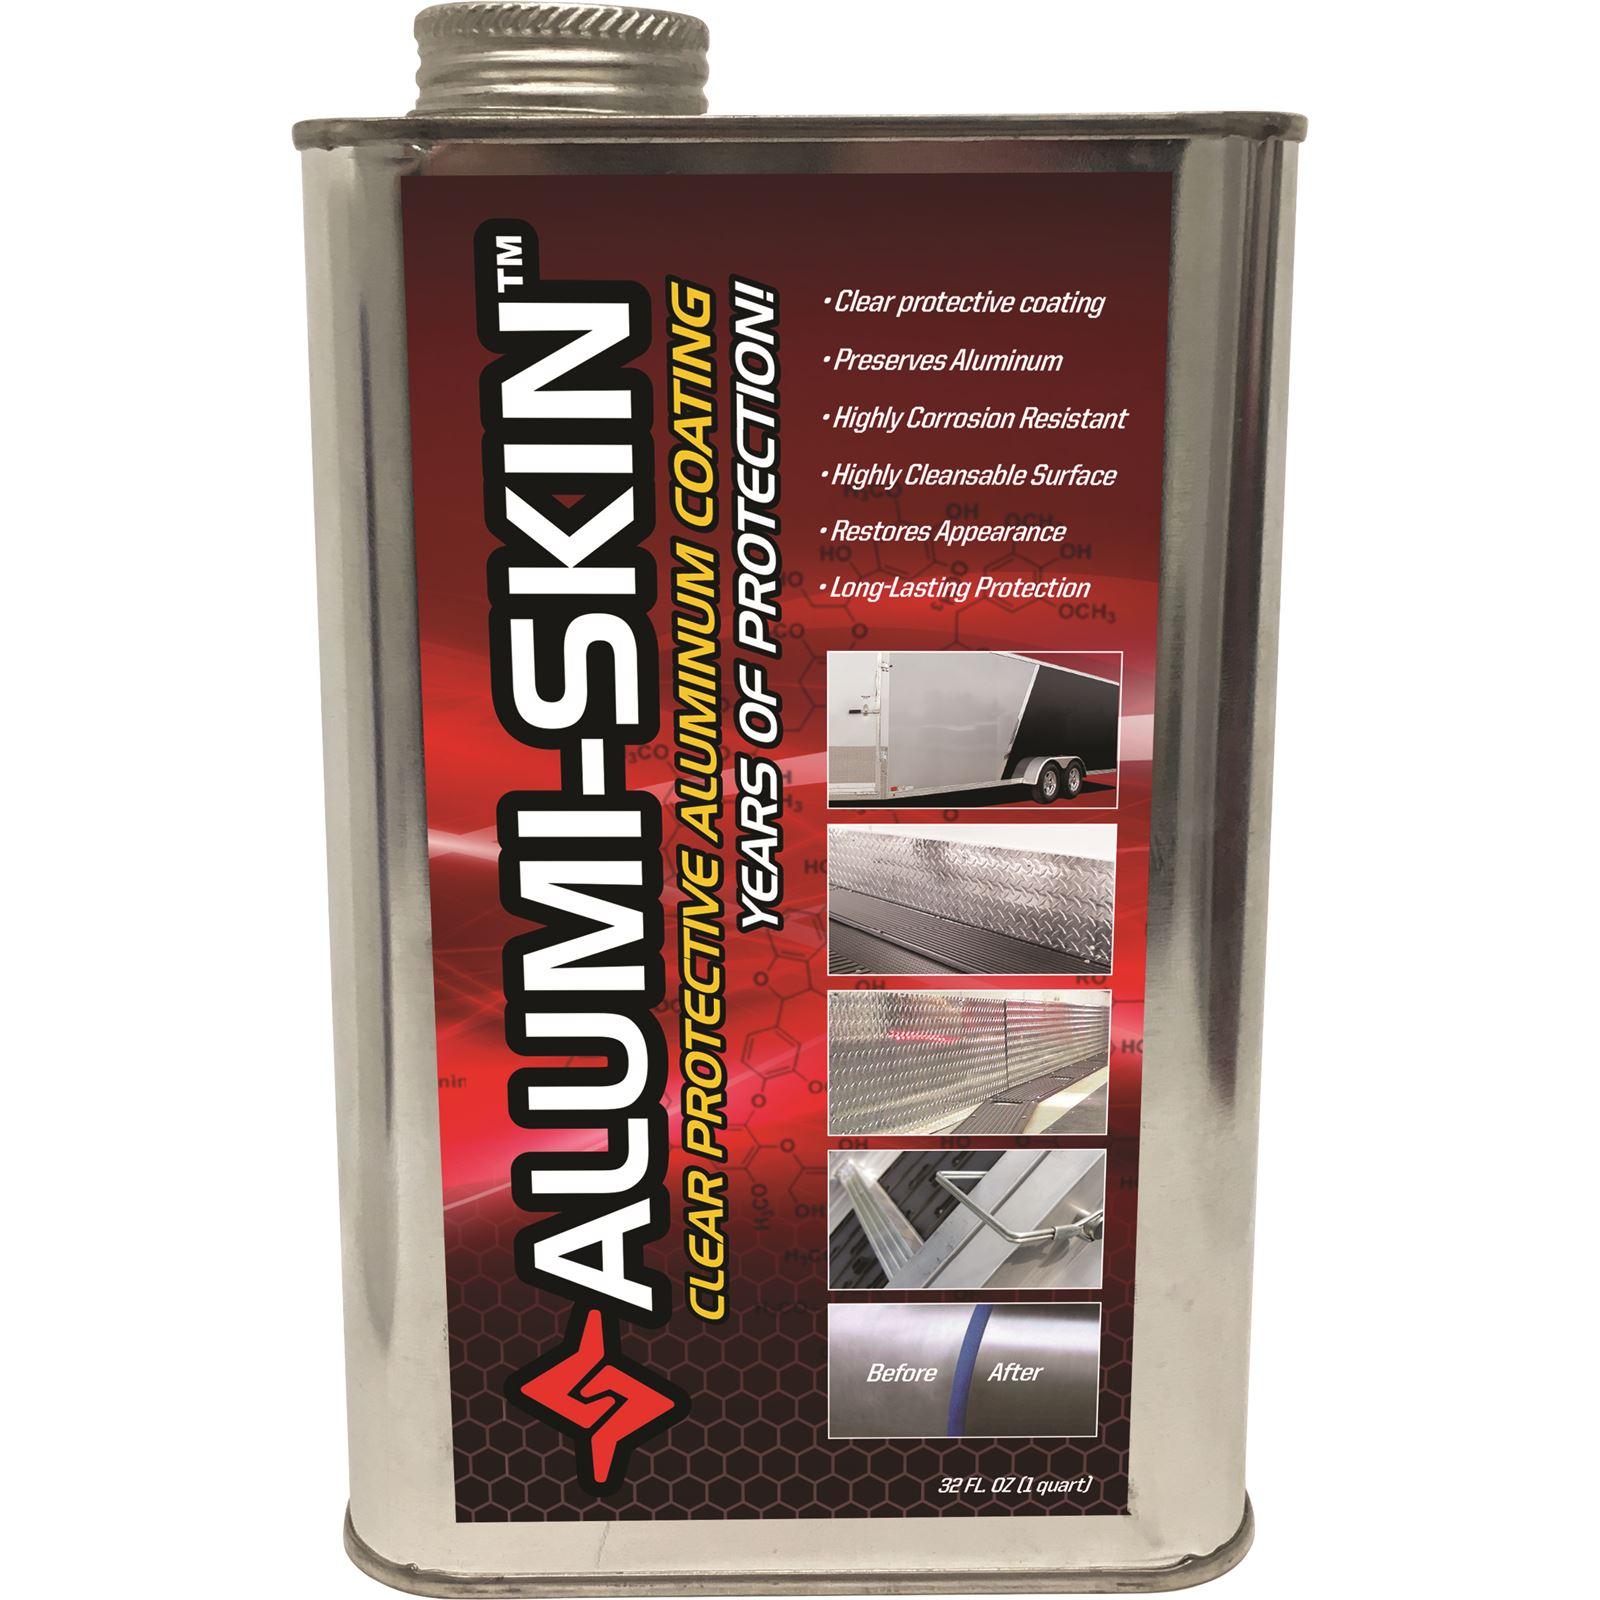 Caliber Alumi-Skin Protective Coating